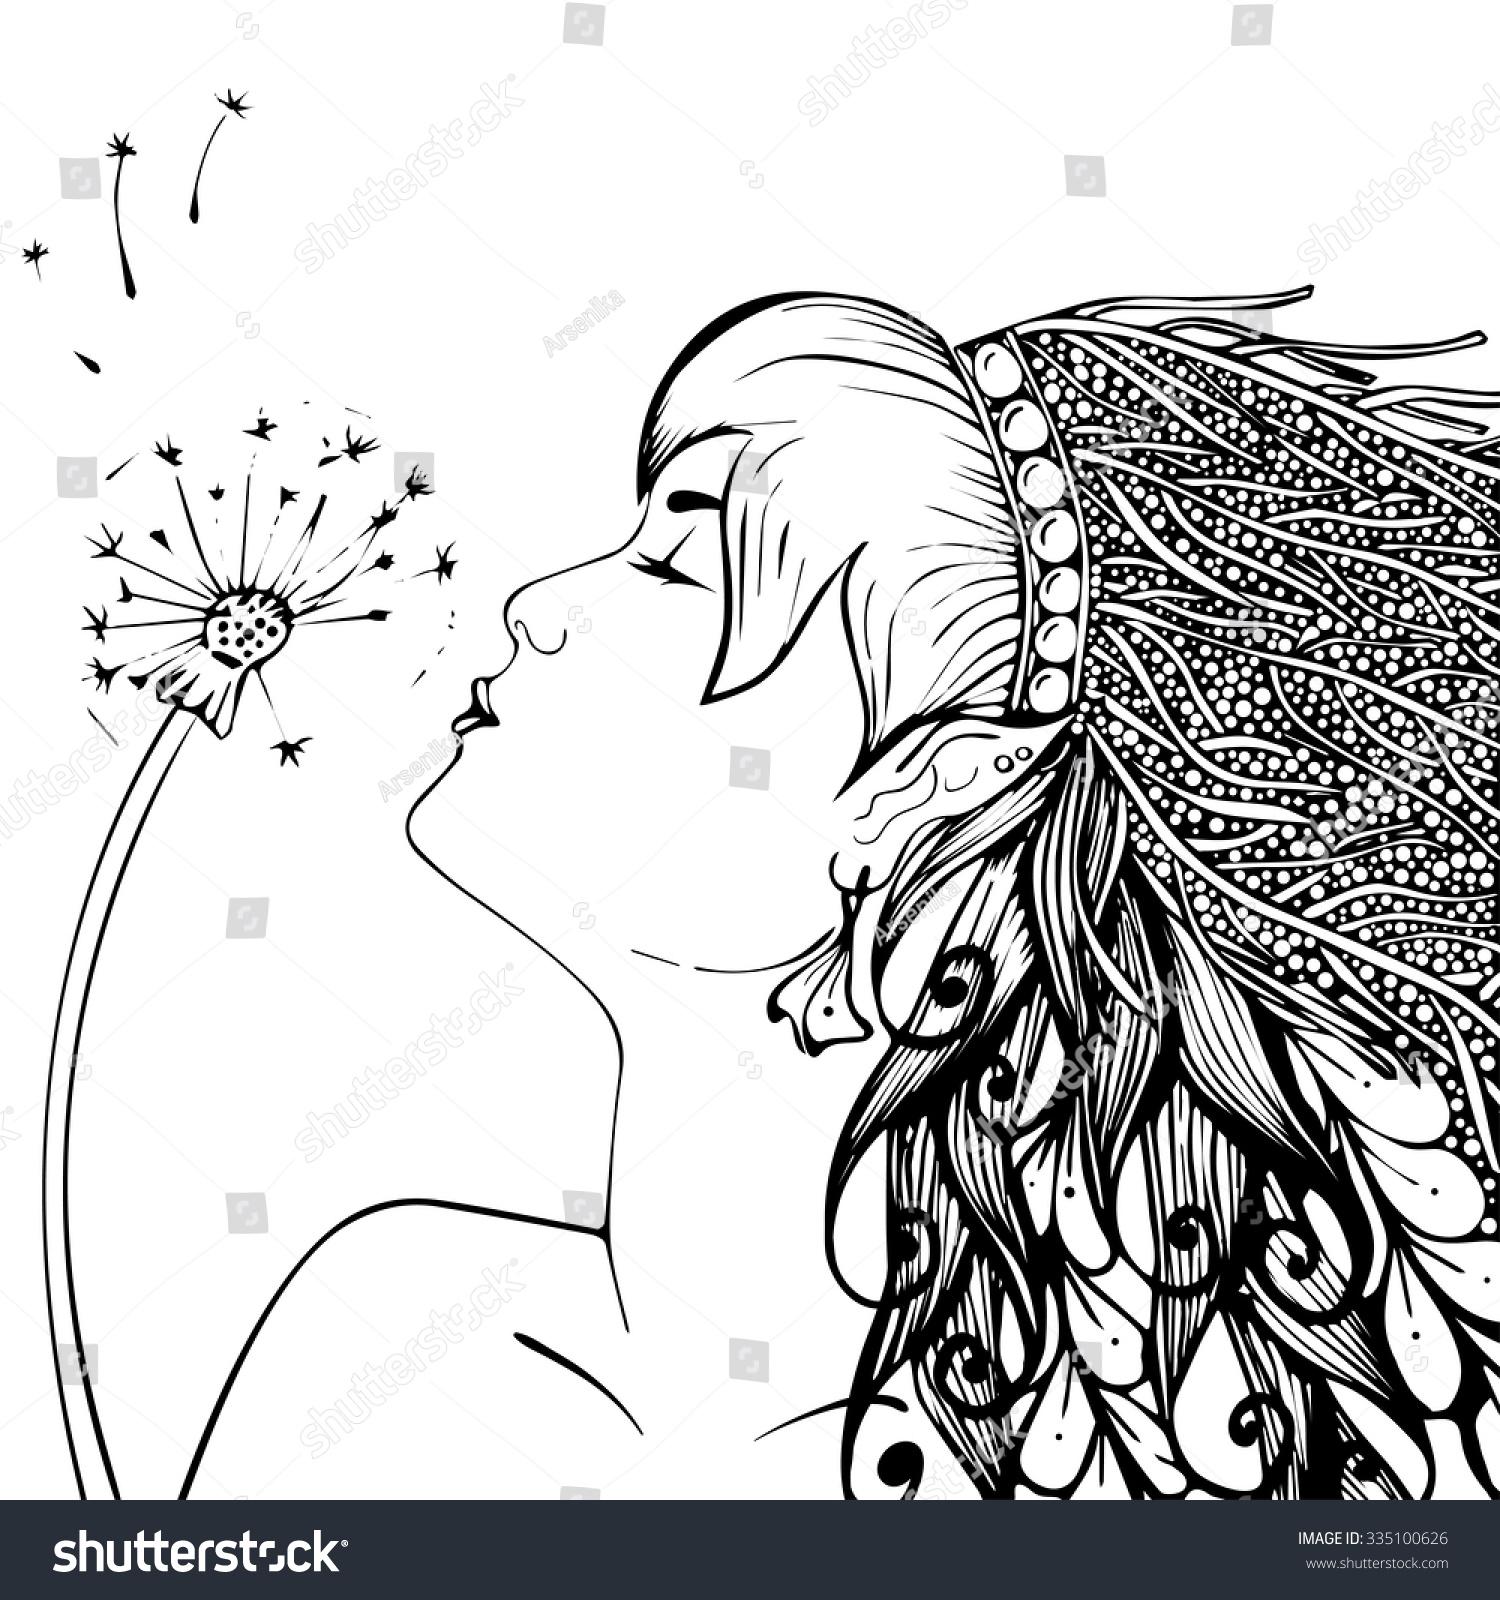 Elf Girl Dandelion Black White Coloring Stock Vector (Royalty Free ...